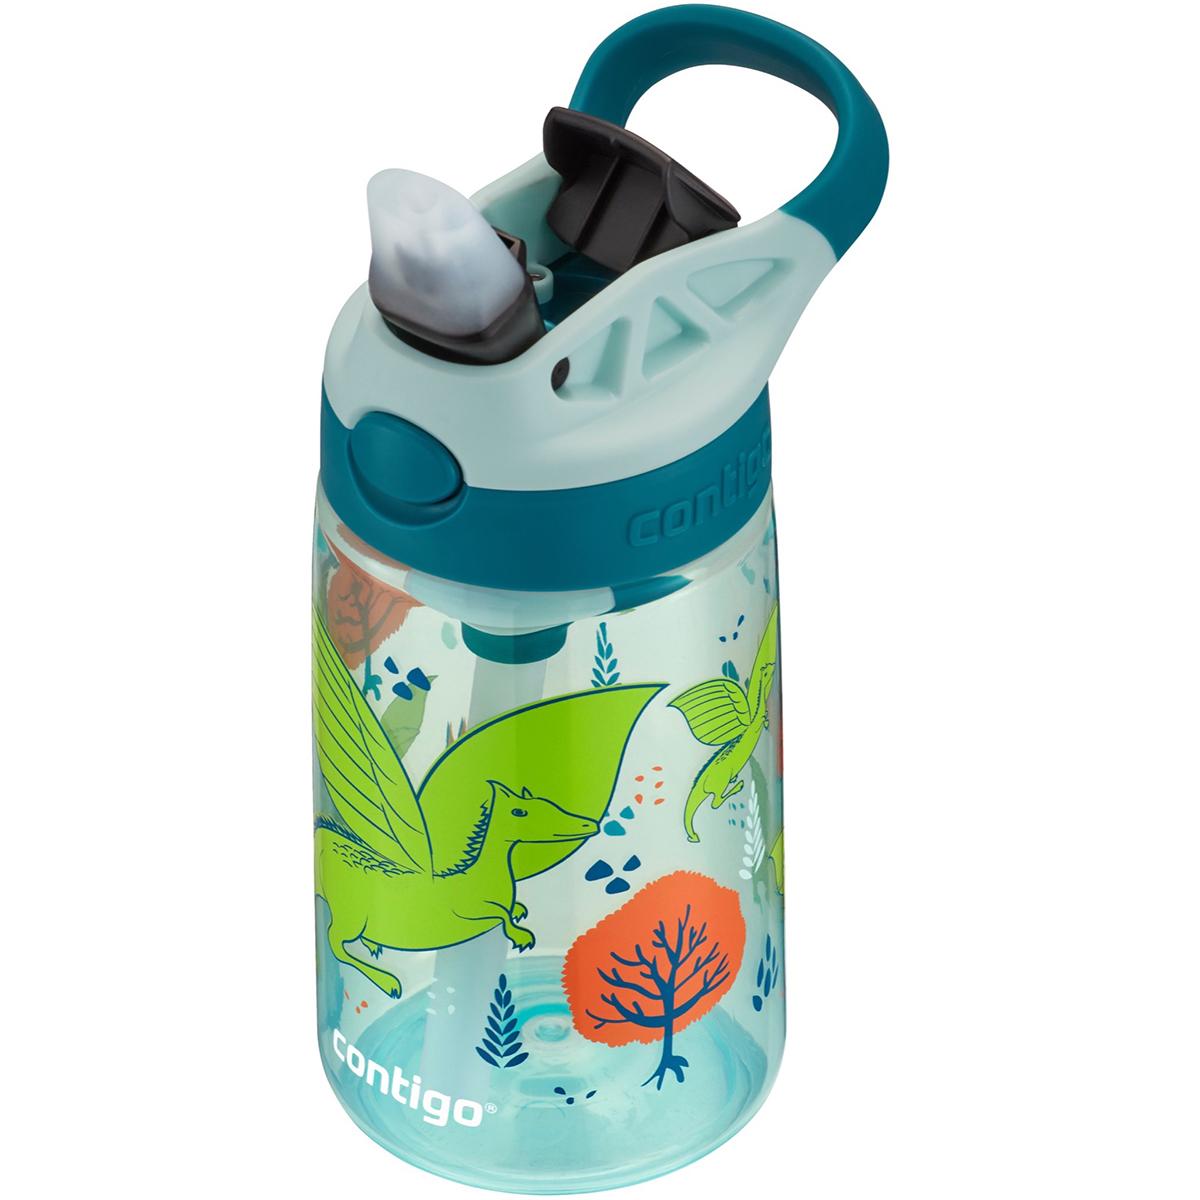 Contigo-Kid-039-s-14-oz-AutoSpout-Straw-Water-Bottle-with-Easy-Clean-Lid thumbnail 13